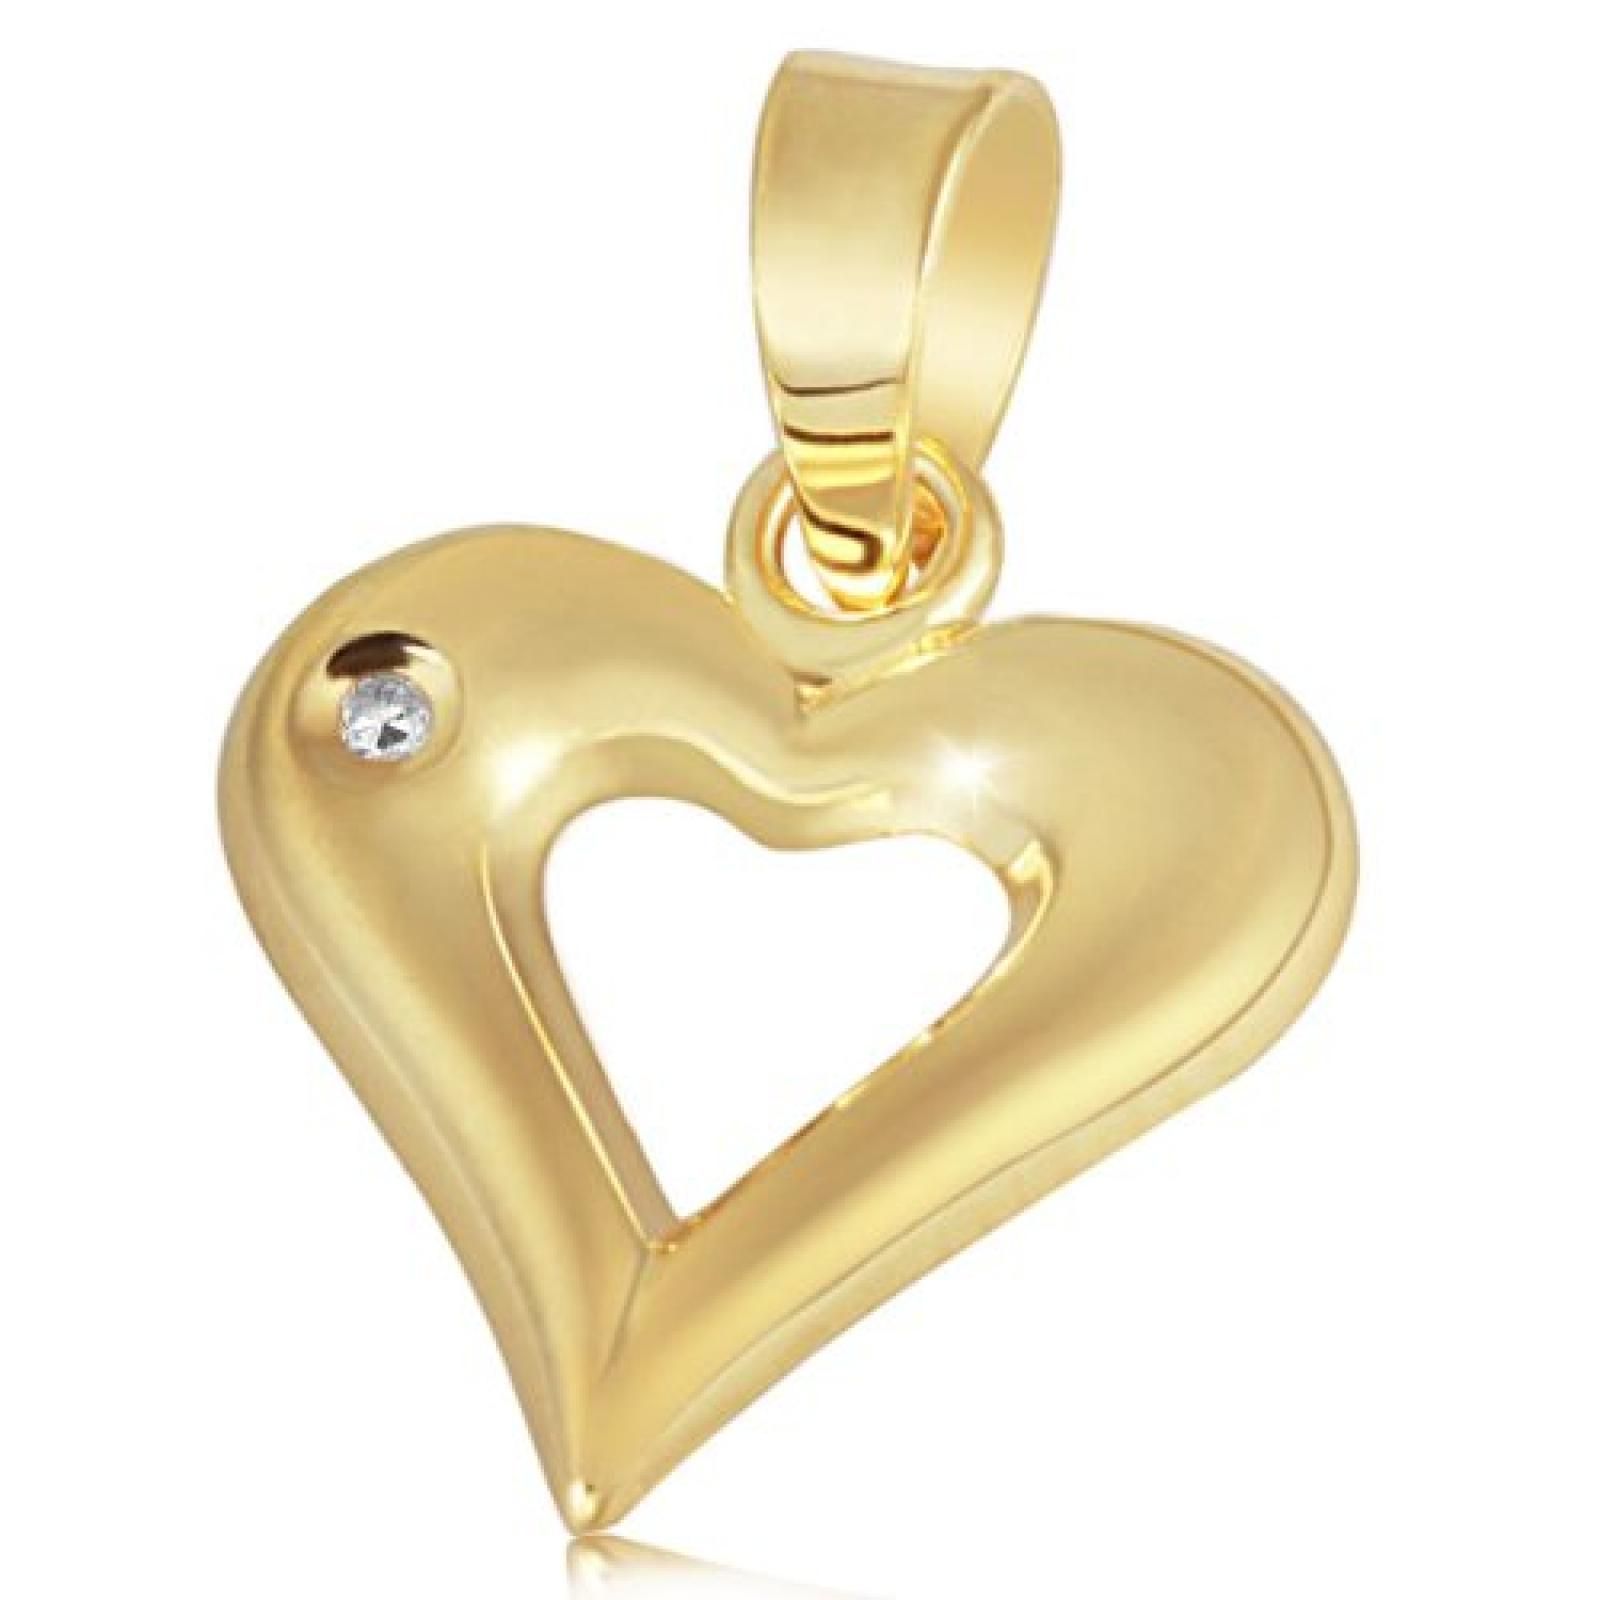 Goldmaid Damen-Anhänger Herz 585 Gelbgold 1 Diamant 0,01 ct Pr A2410GG